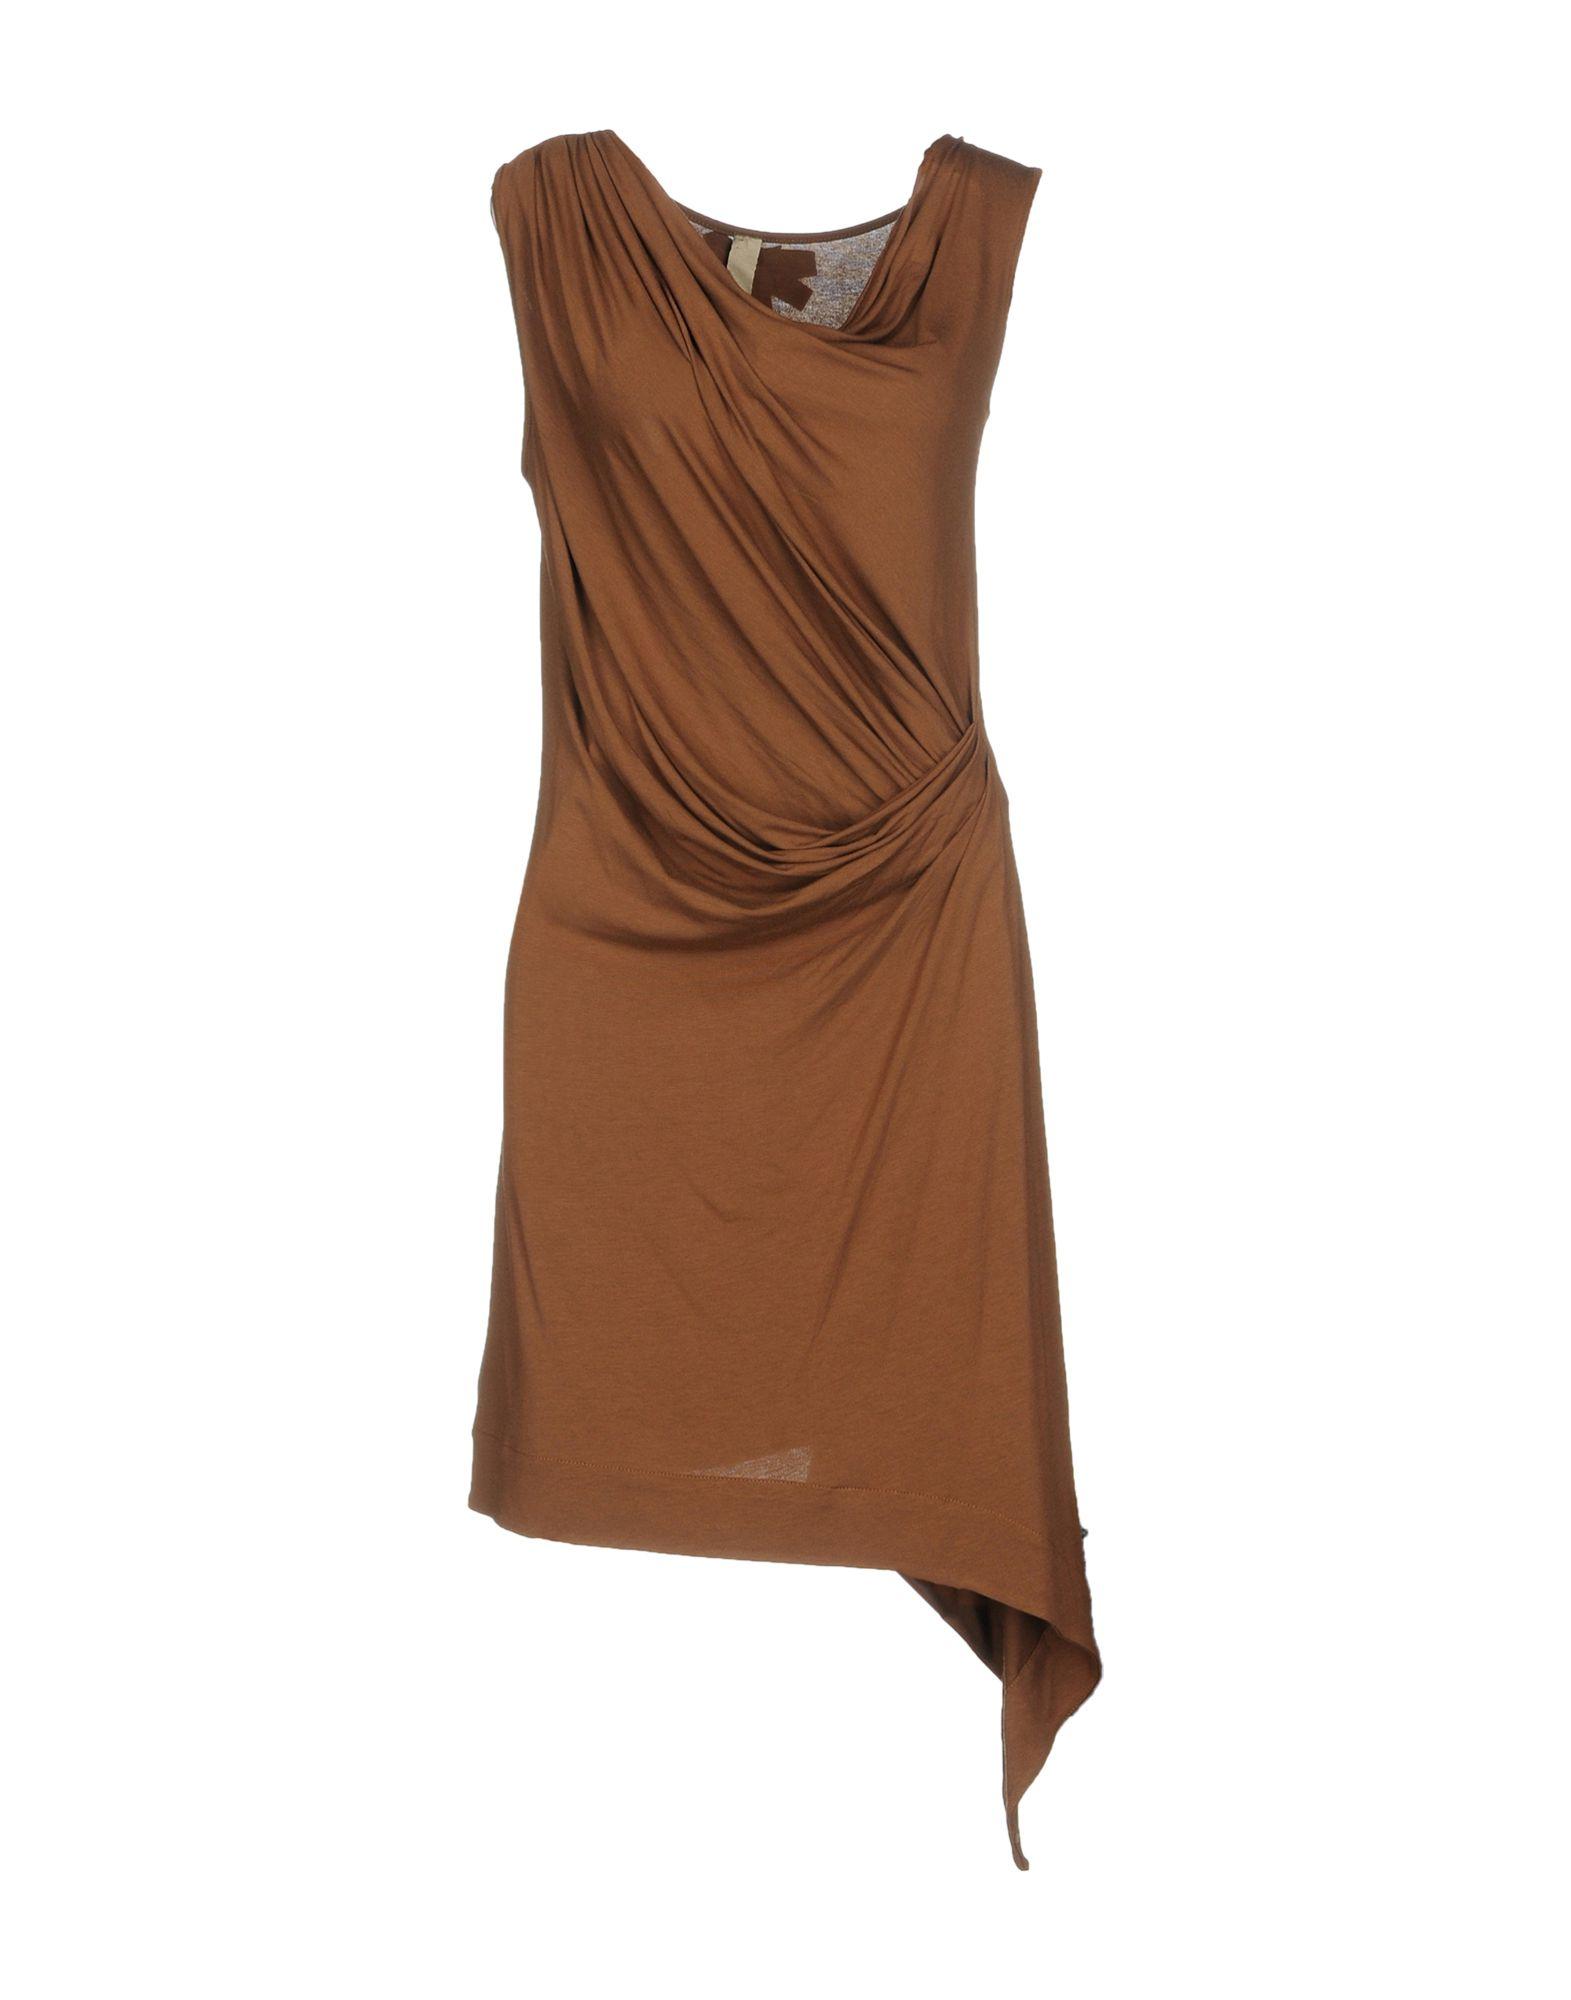 LE COEUR de TWIN-SET SIMONA BARBIERI Короткое платье колье coeur de lion 4838 10 1500